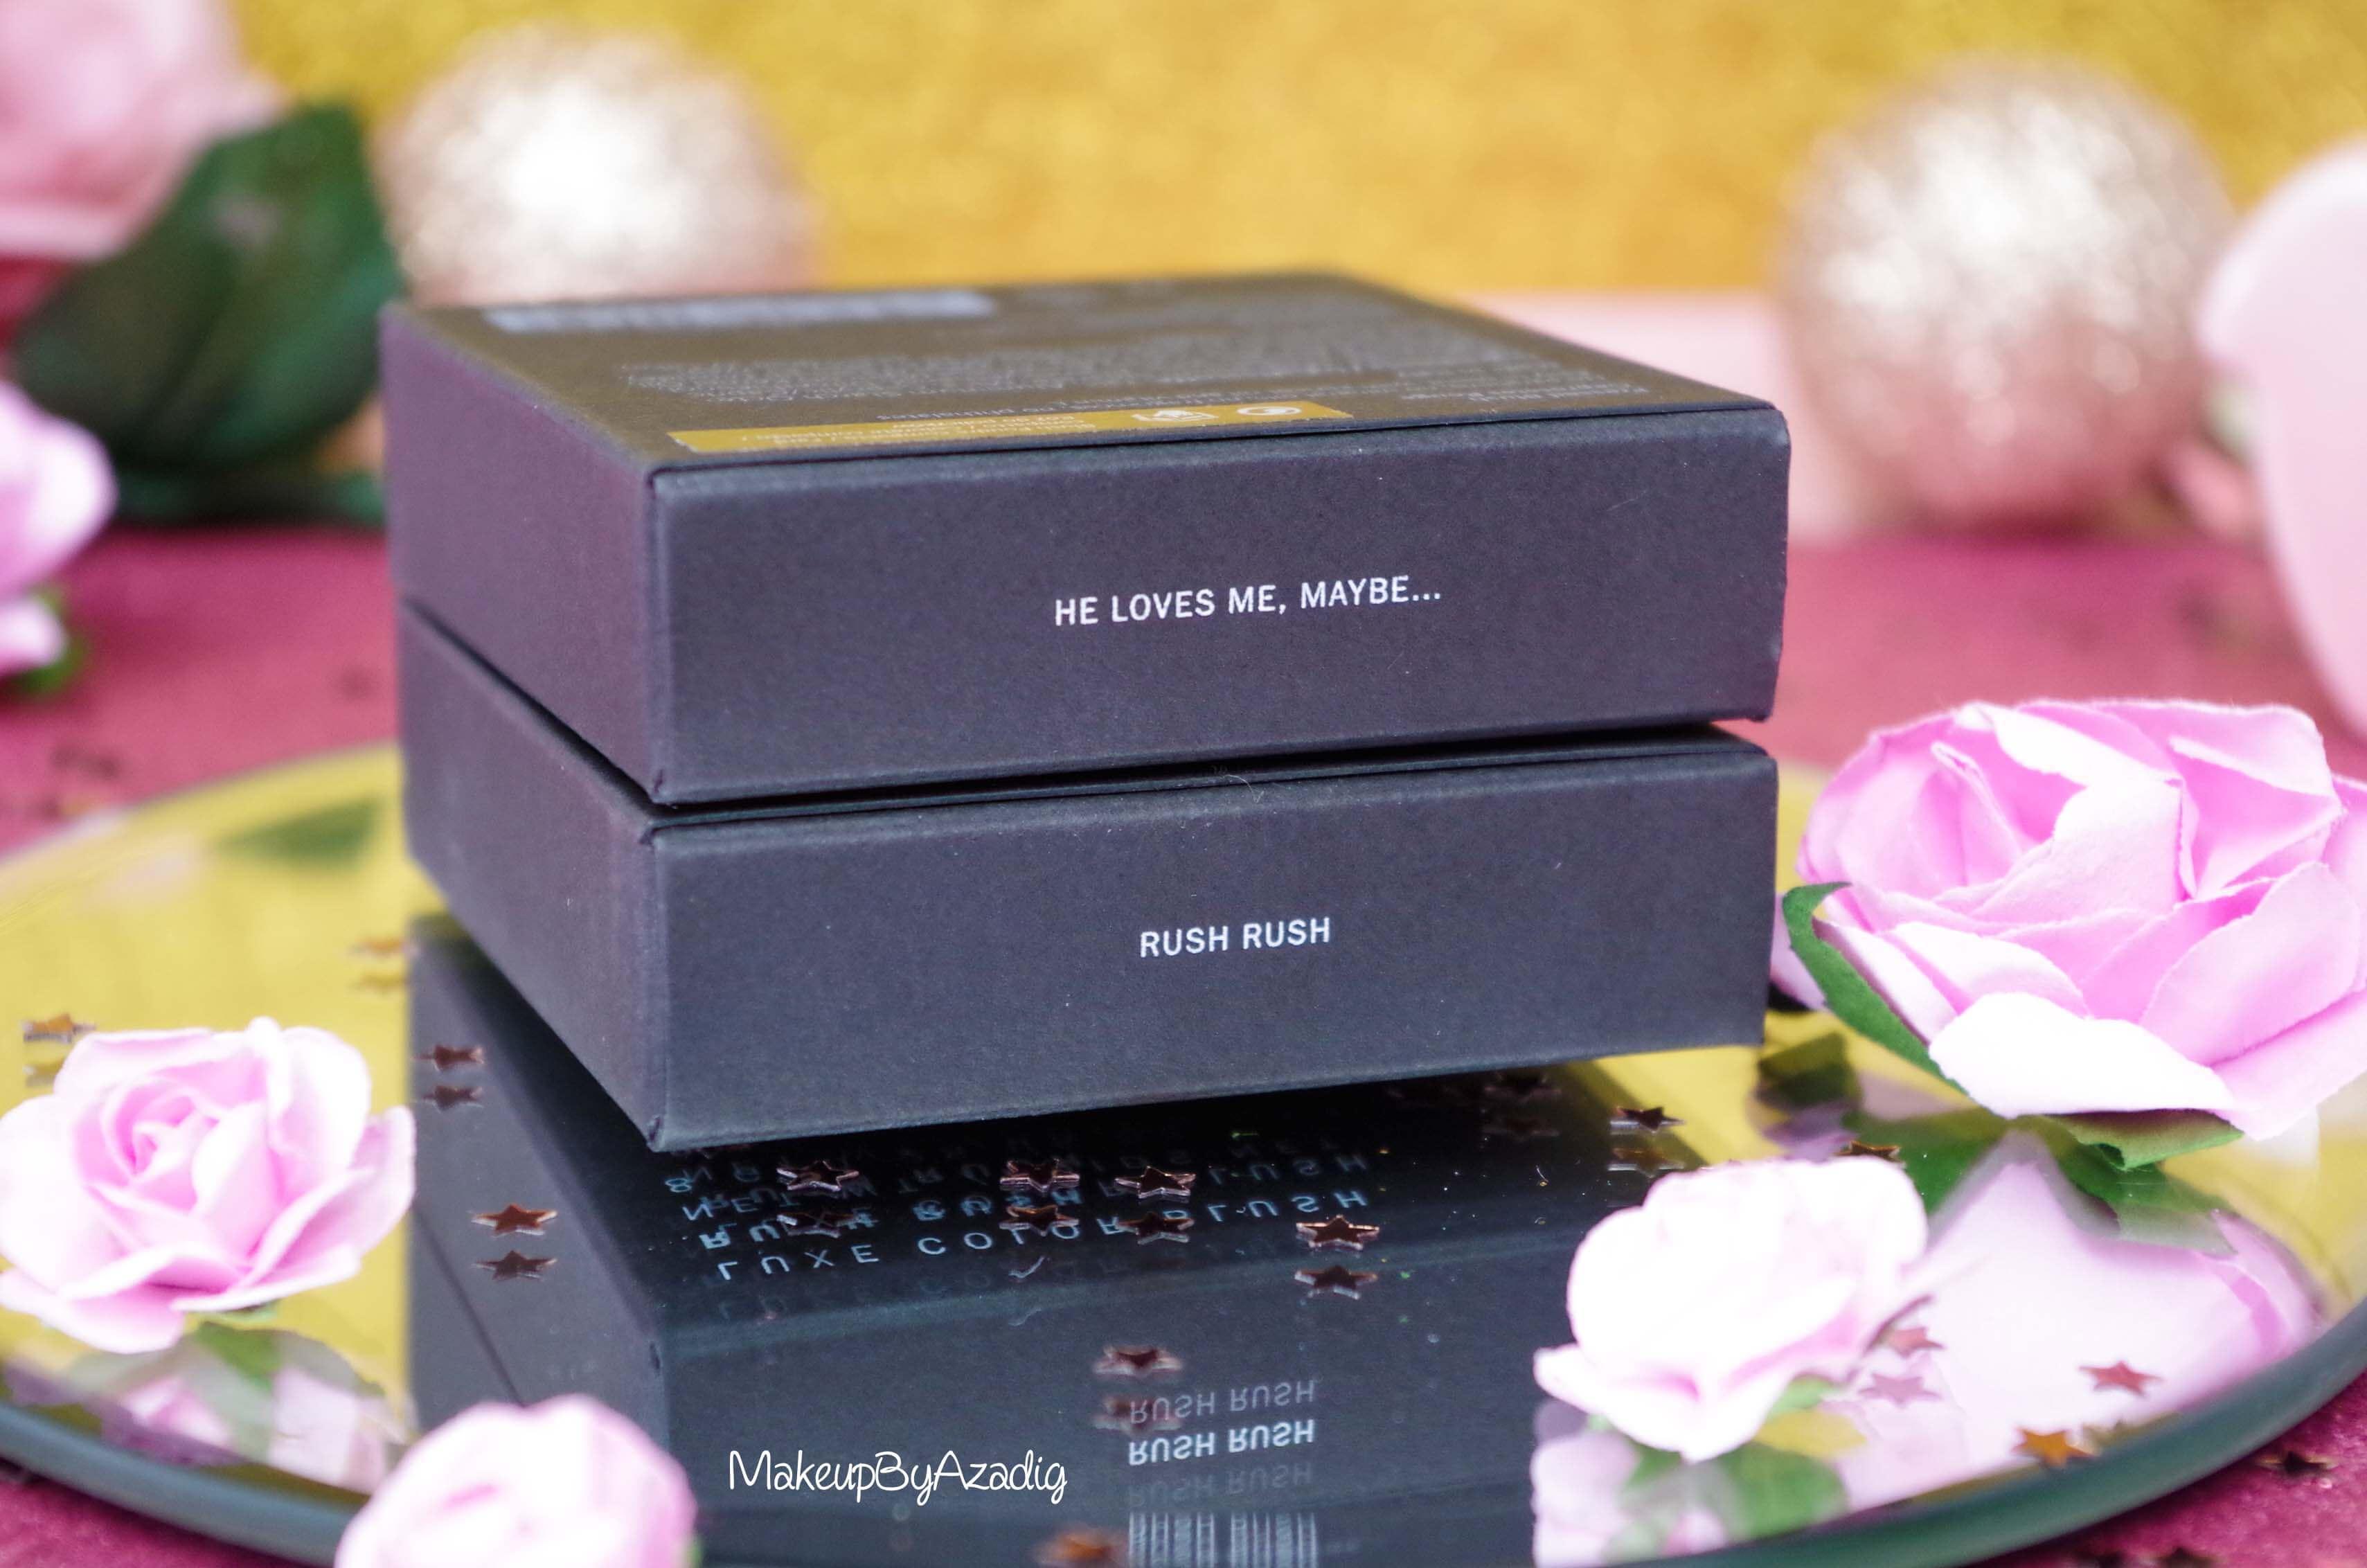 revue-review-luxe-color-blush-zoeva-sephora-france-helovesmemaybe-rush-rush-avis-swatch-makeupbyazadig-paris-teintes